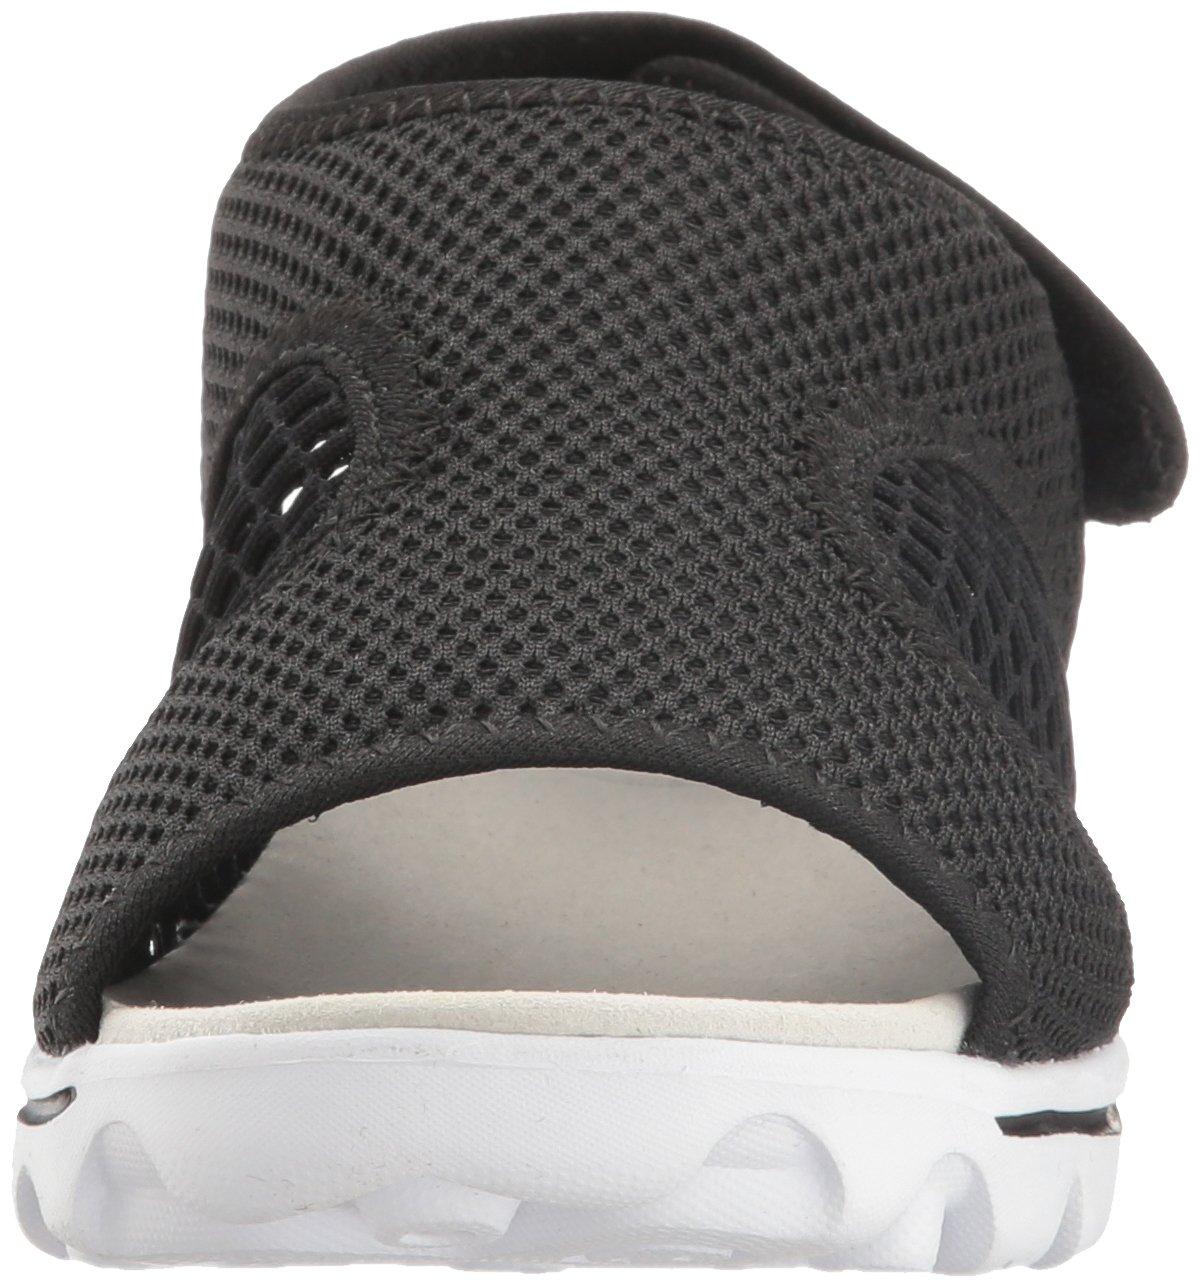 Propet Women's 6.5 TravelActiv Ss Sandal B01IODEXHK 6.5 Women's W US|Black 96171f